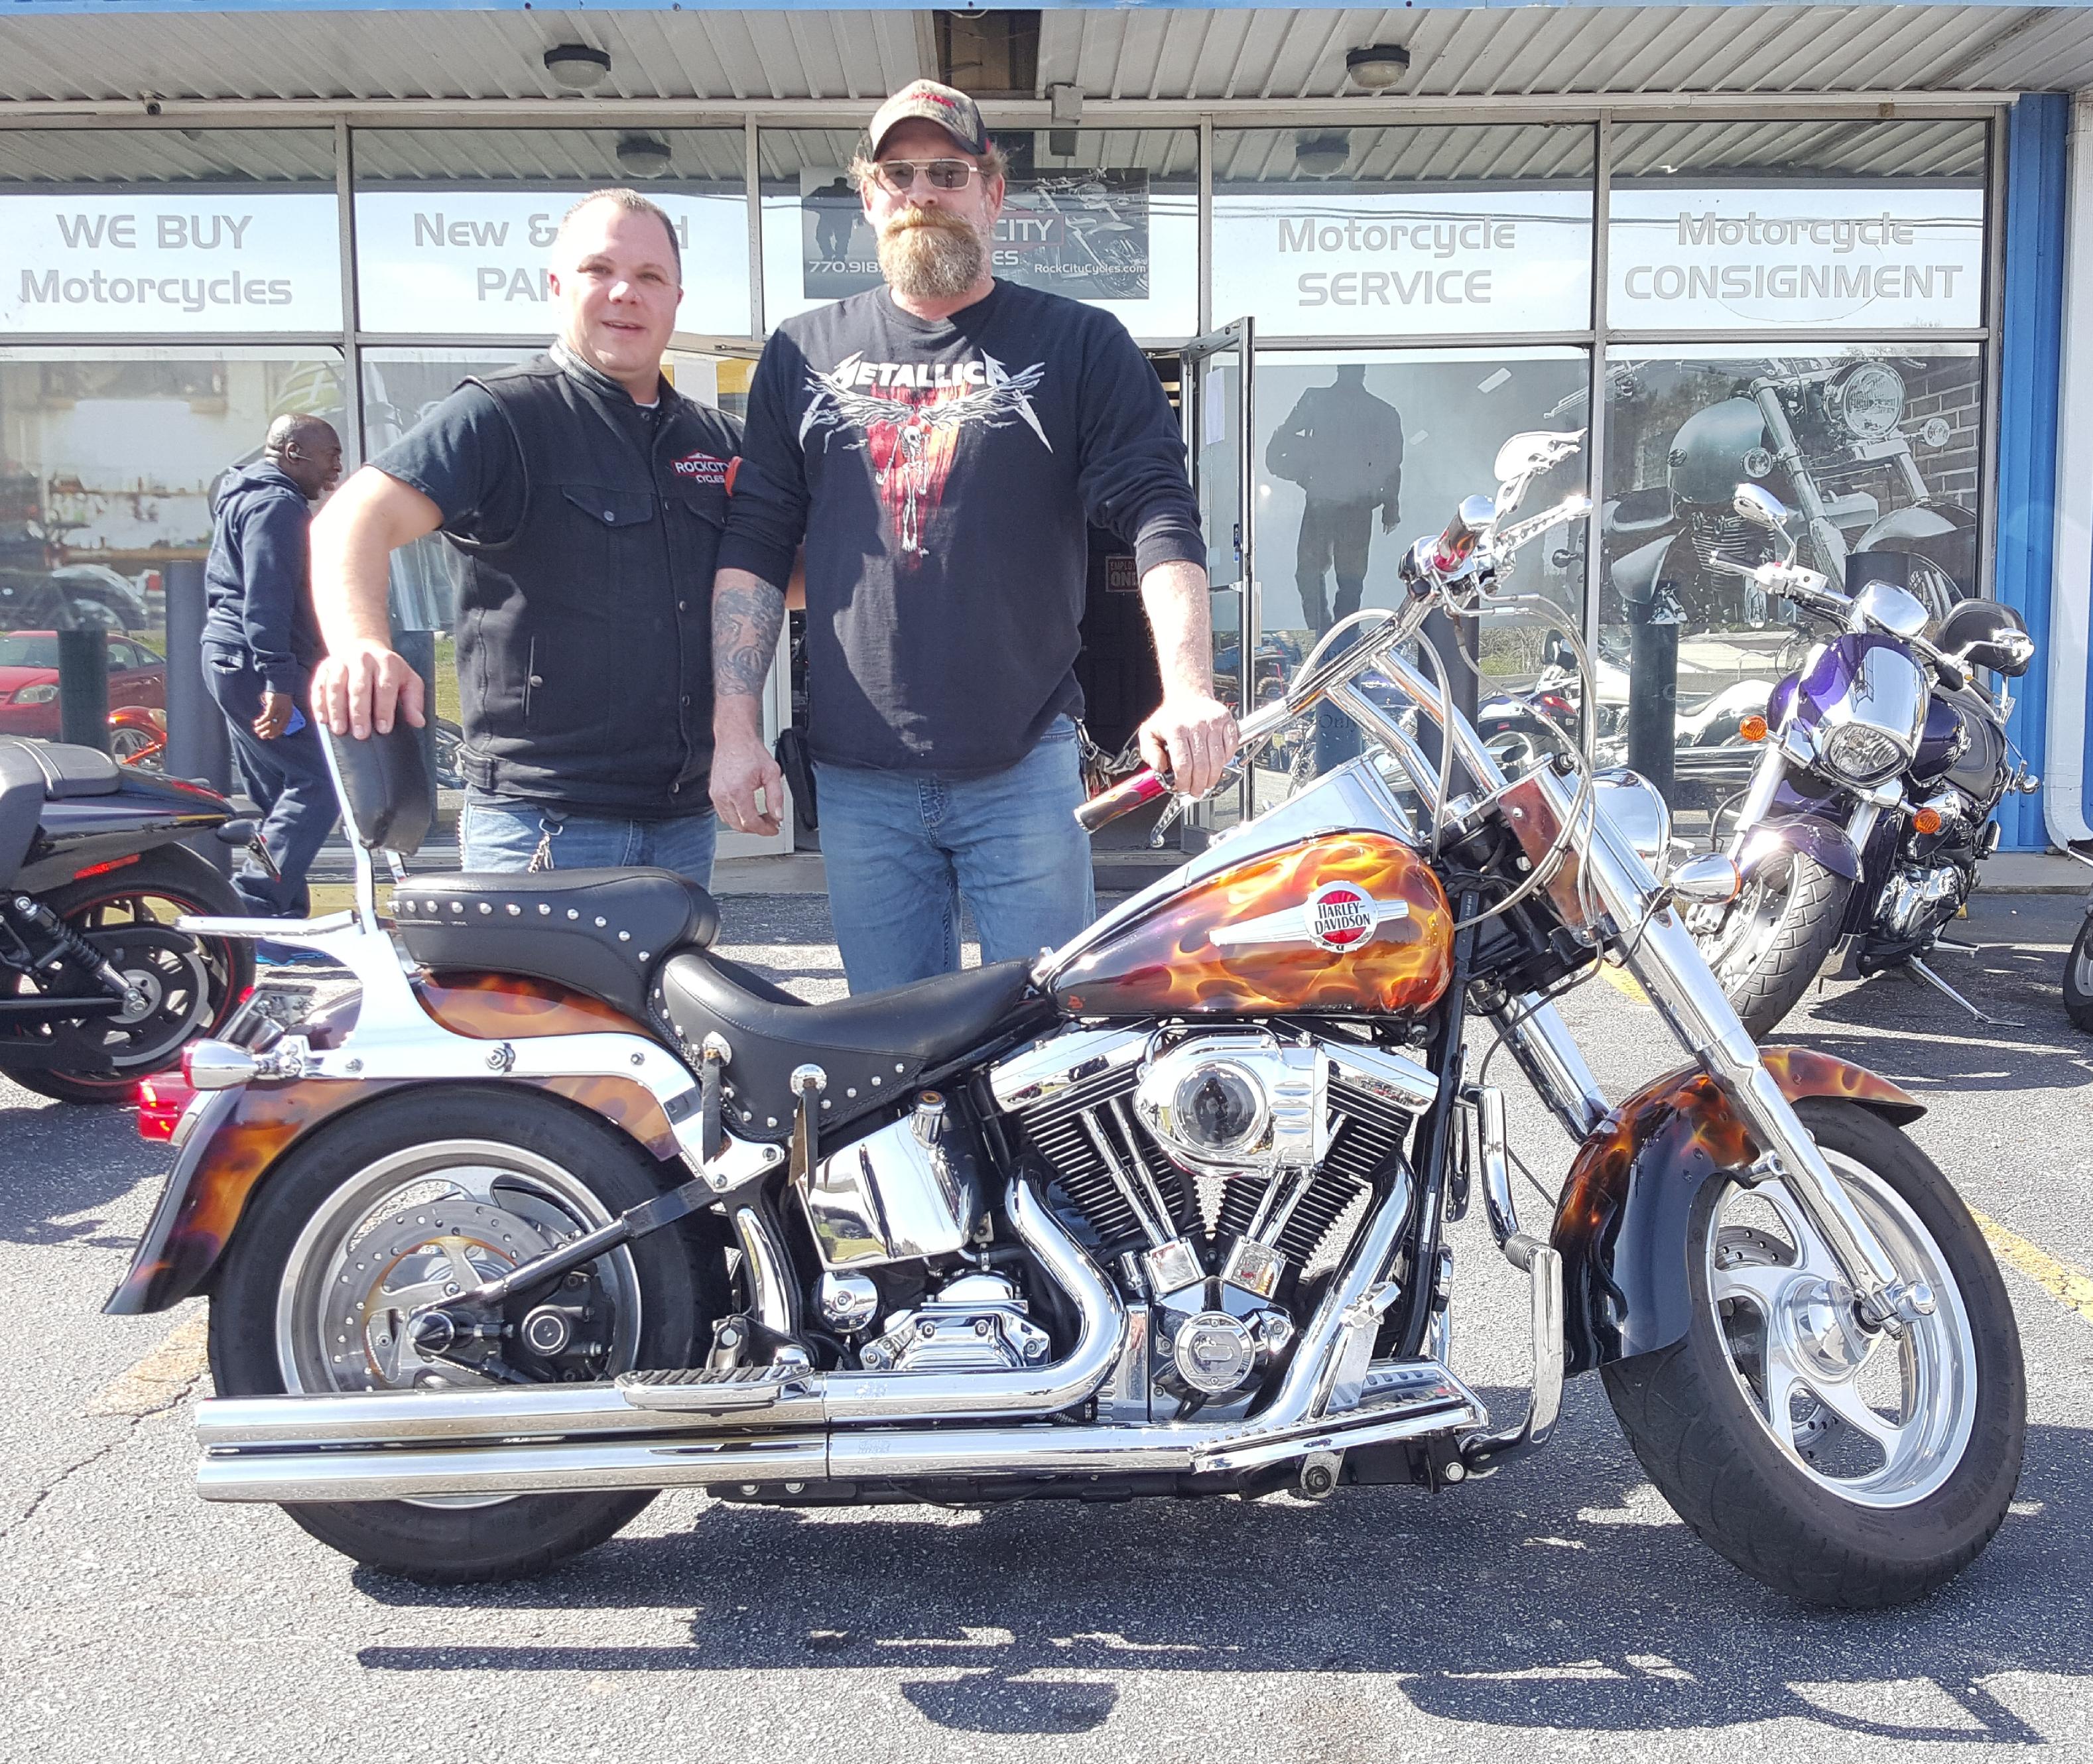 Michael F. with his 1996 Harley-Davidson FLSTF Fat Boy